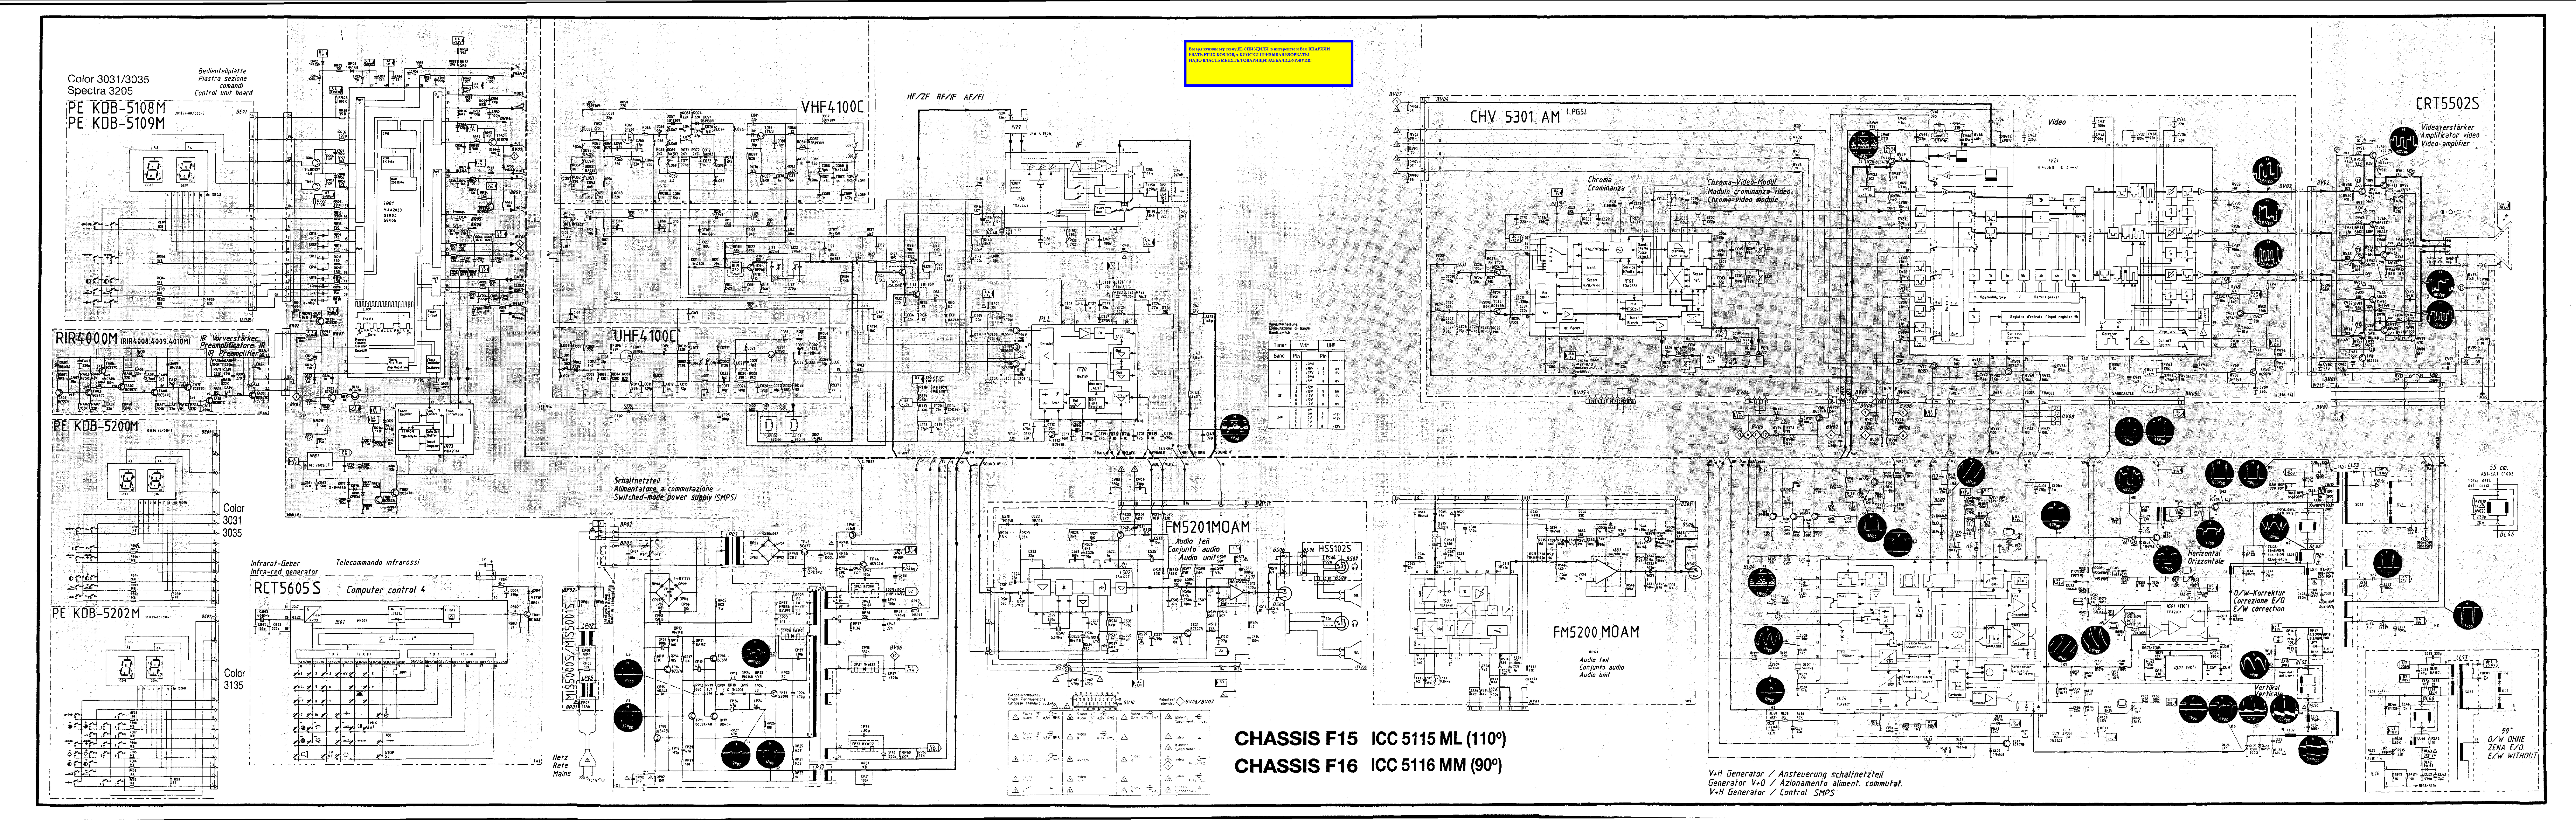 F15 Wiring Diagram - Data Wiring Diagram